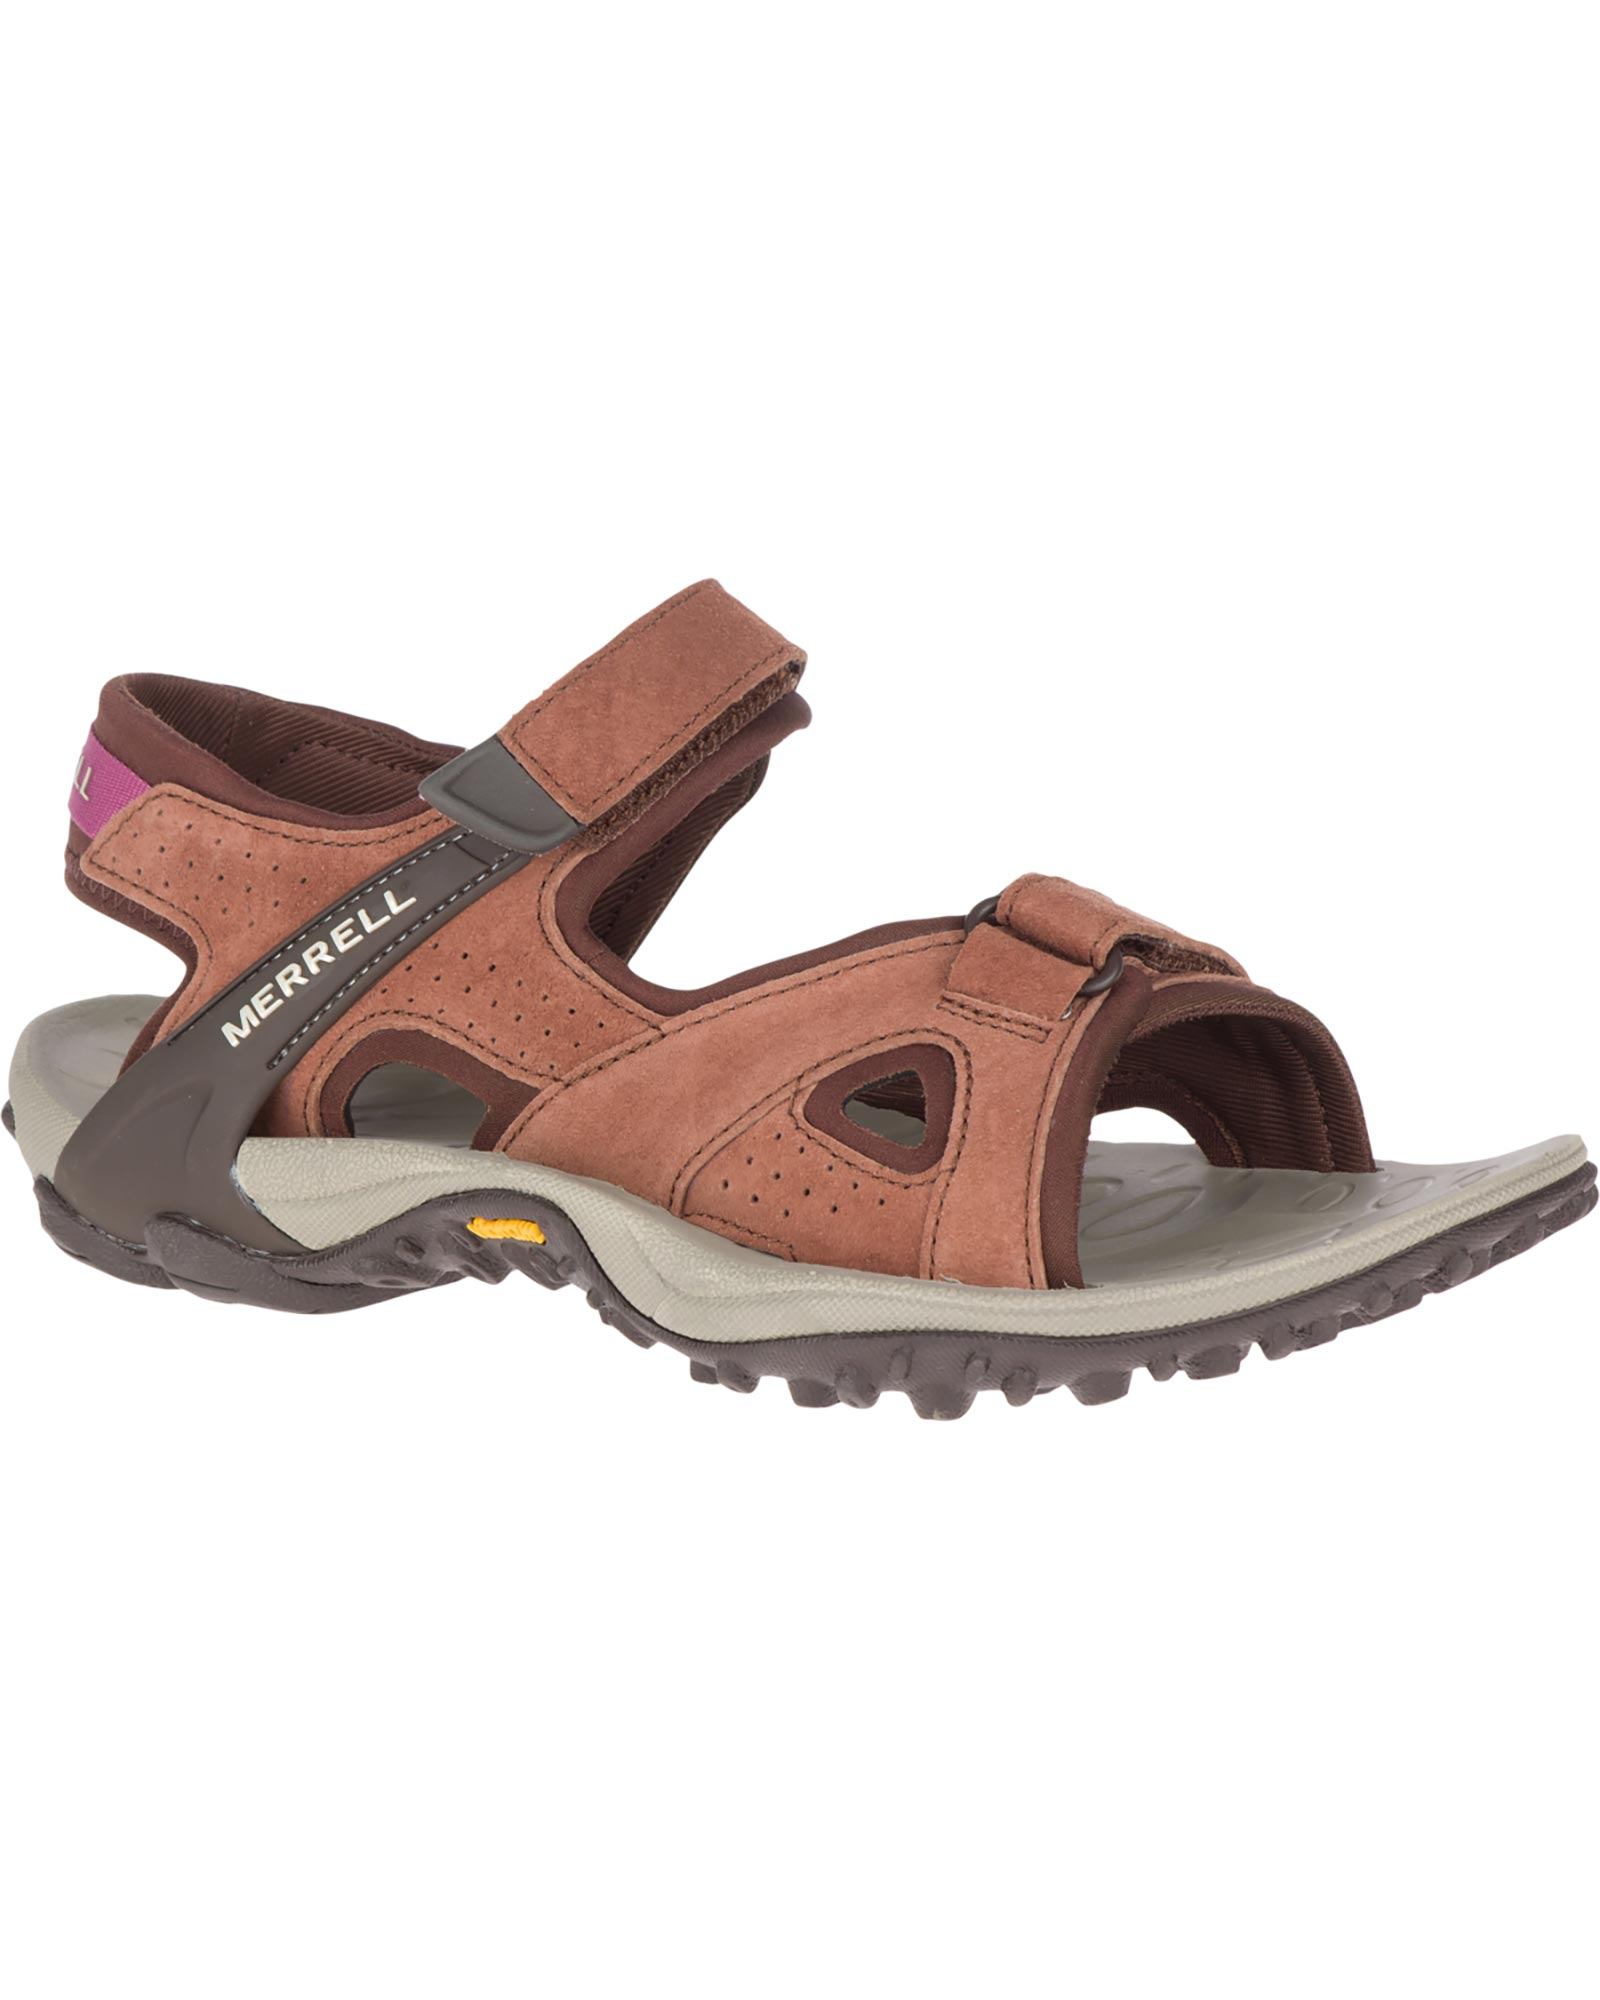 merrell womens sandals size 9 charts